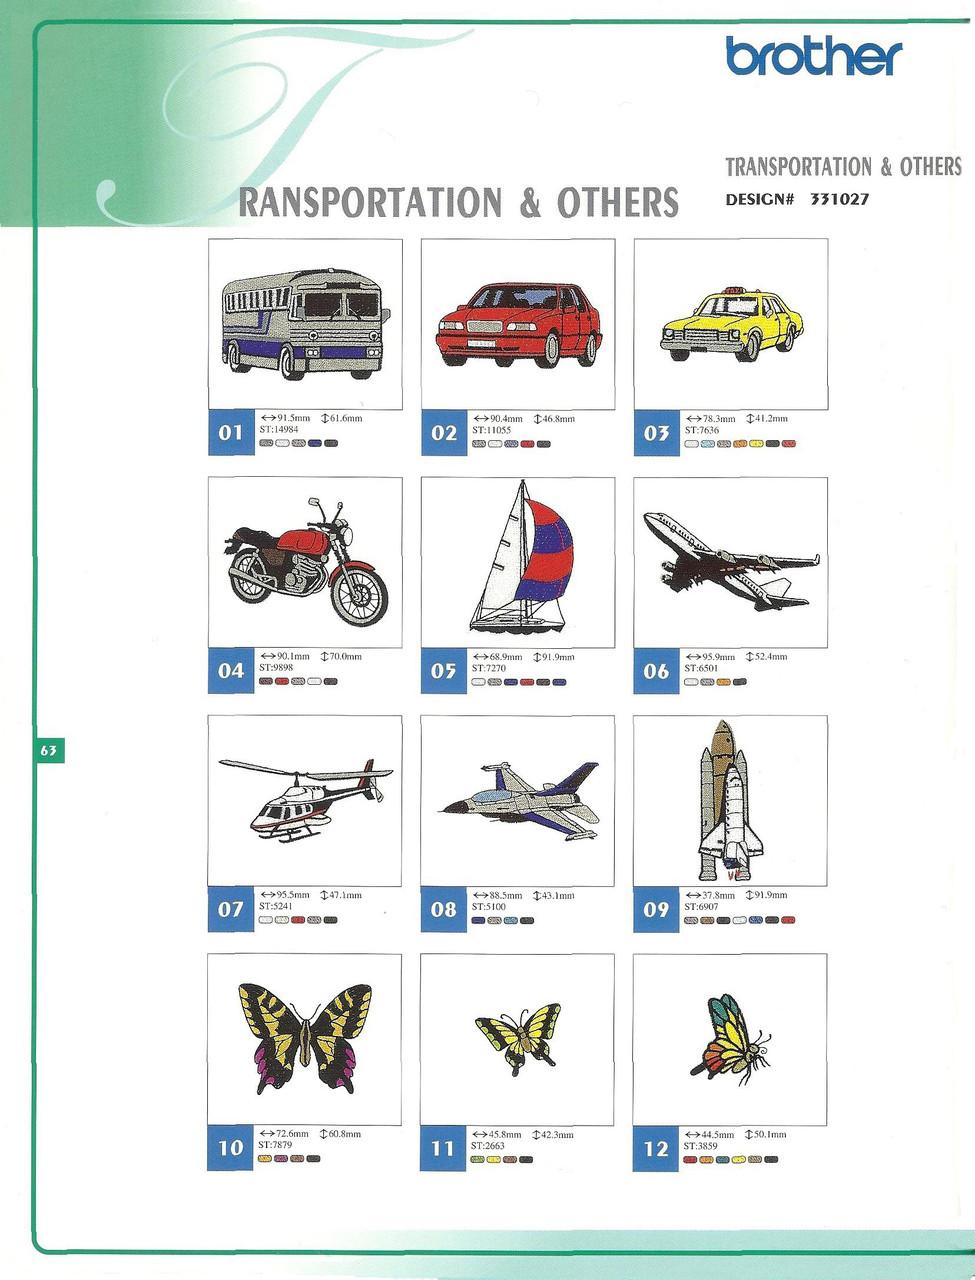 331027 Transportation & Others